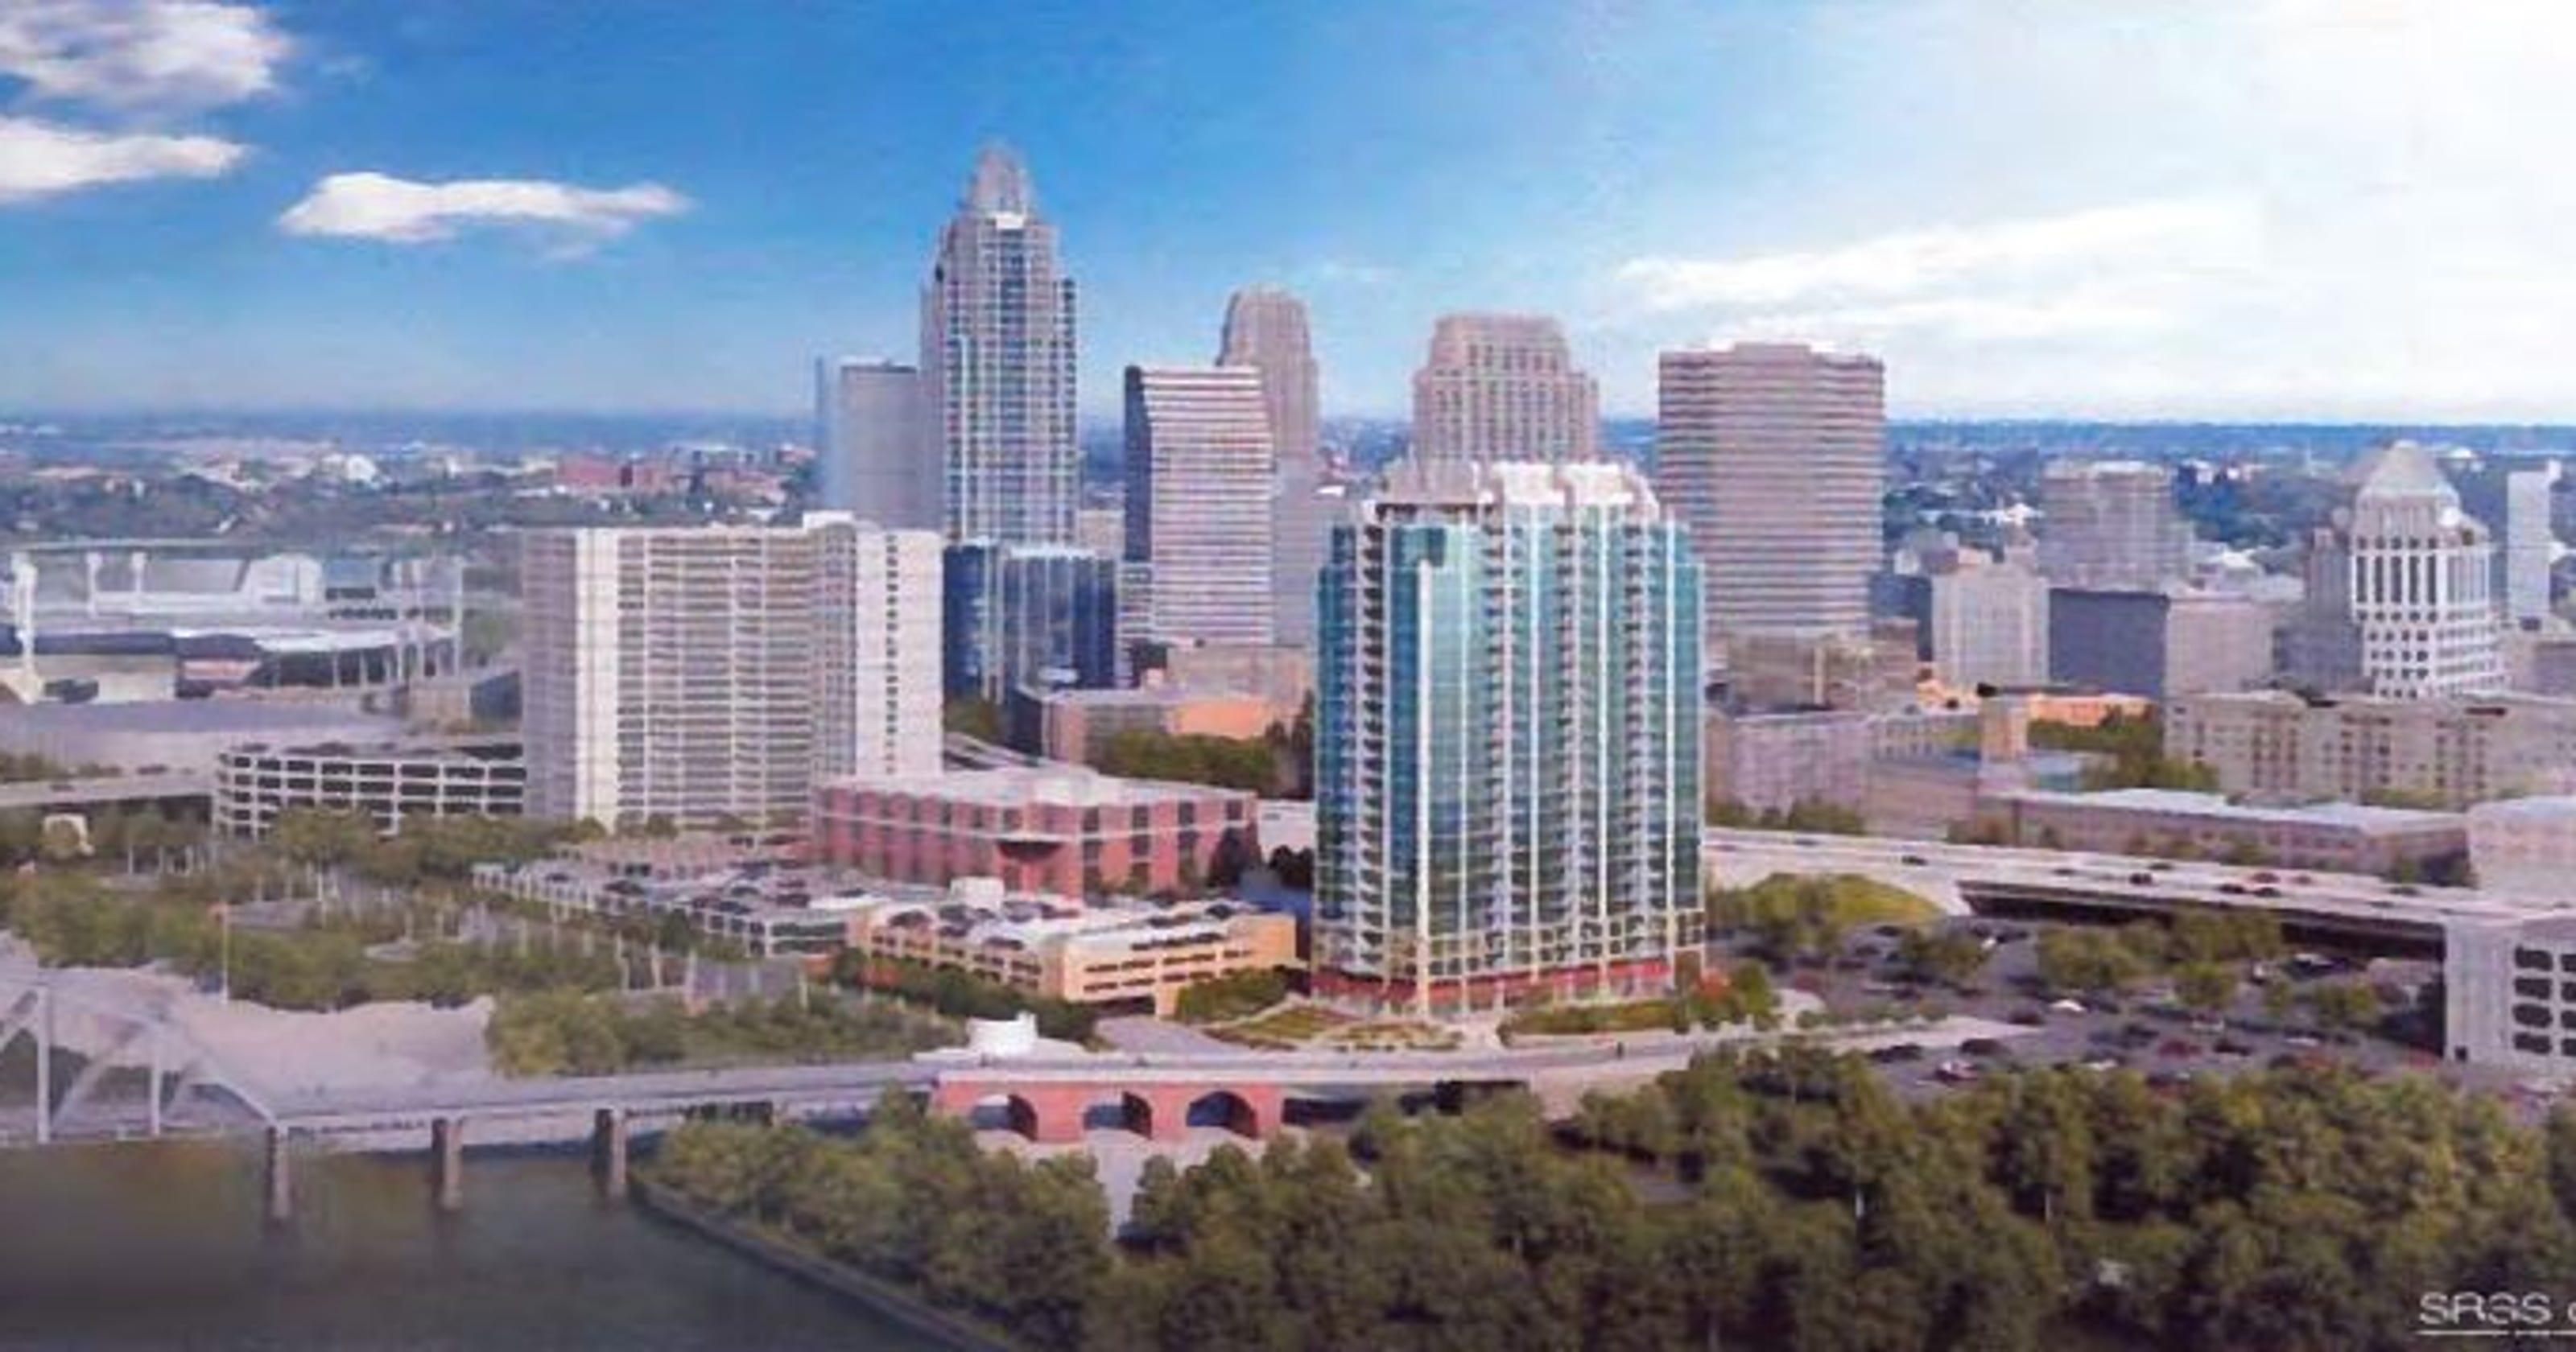 Skyhouse Tower Will Add 352 Apartments On Cincinnati